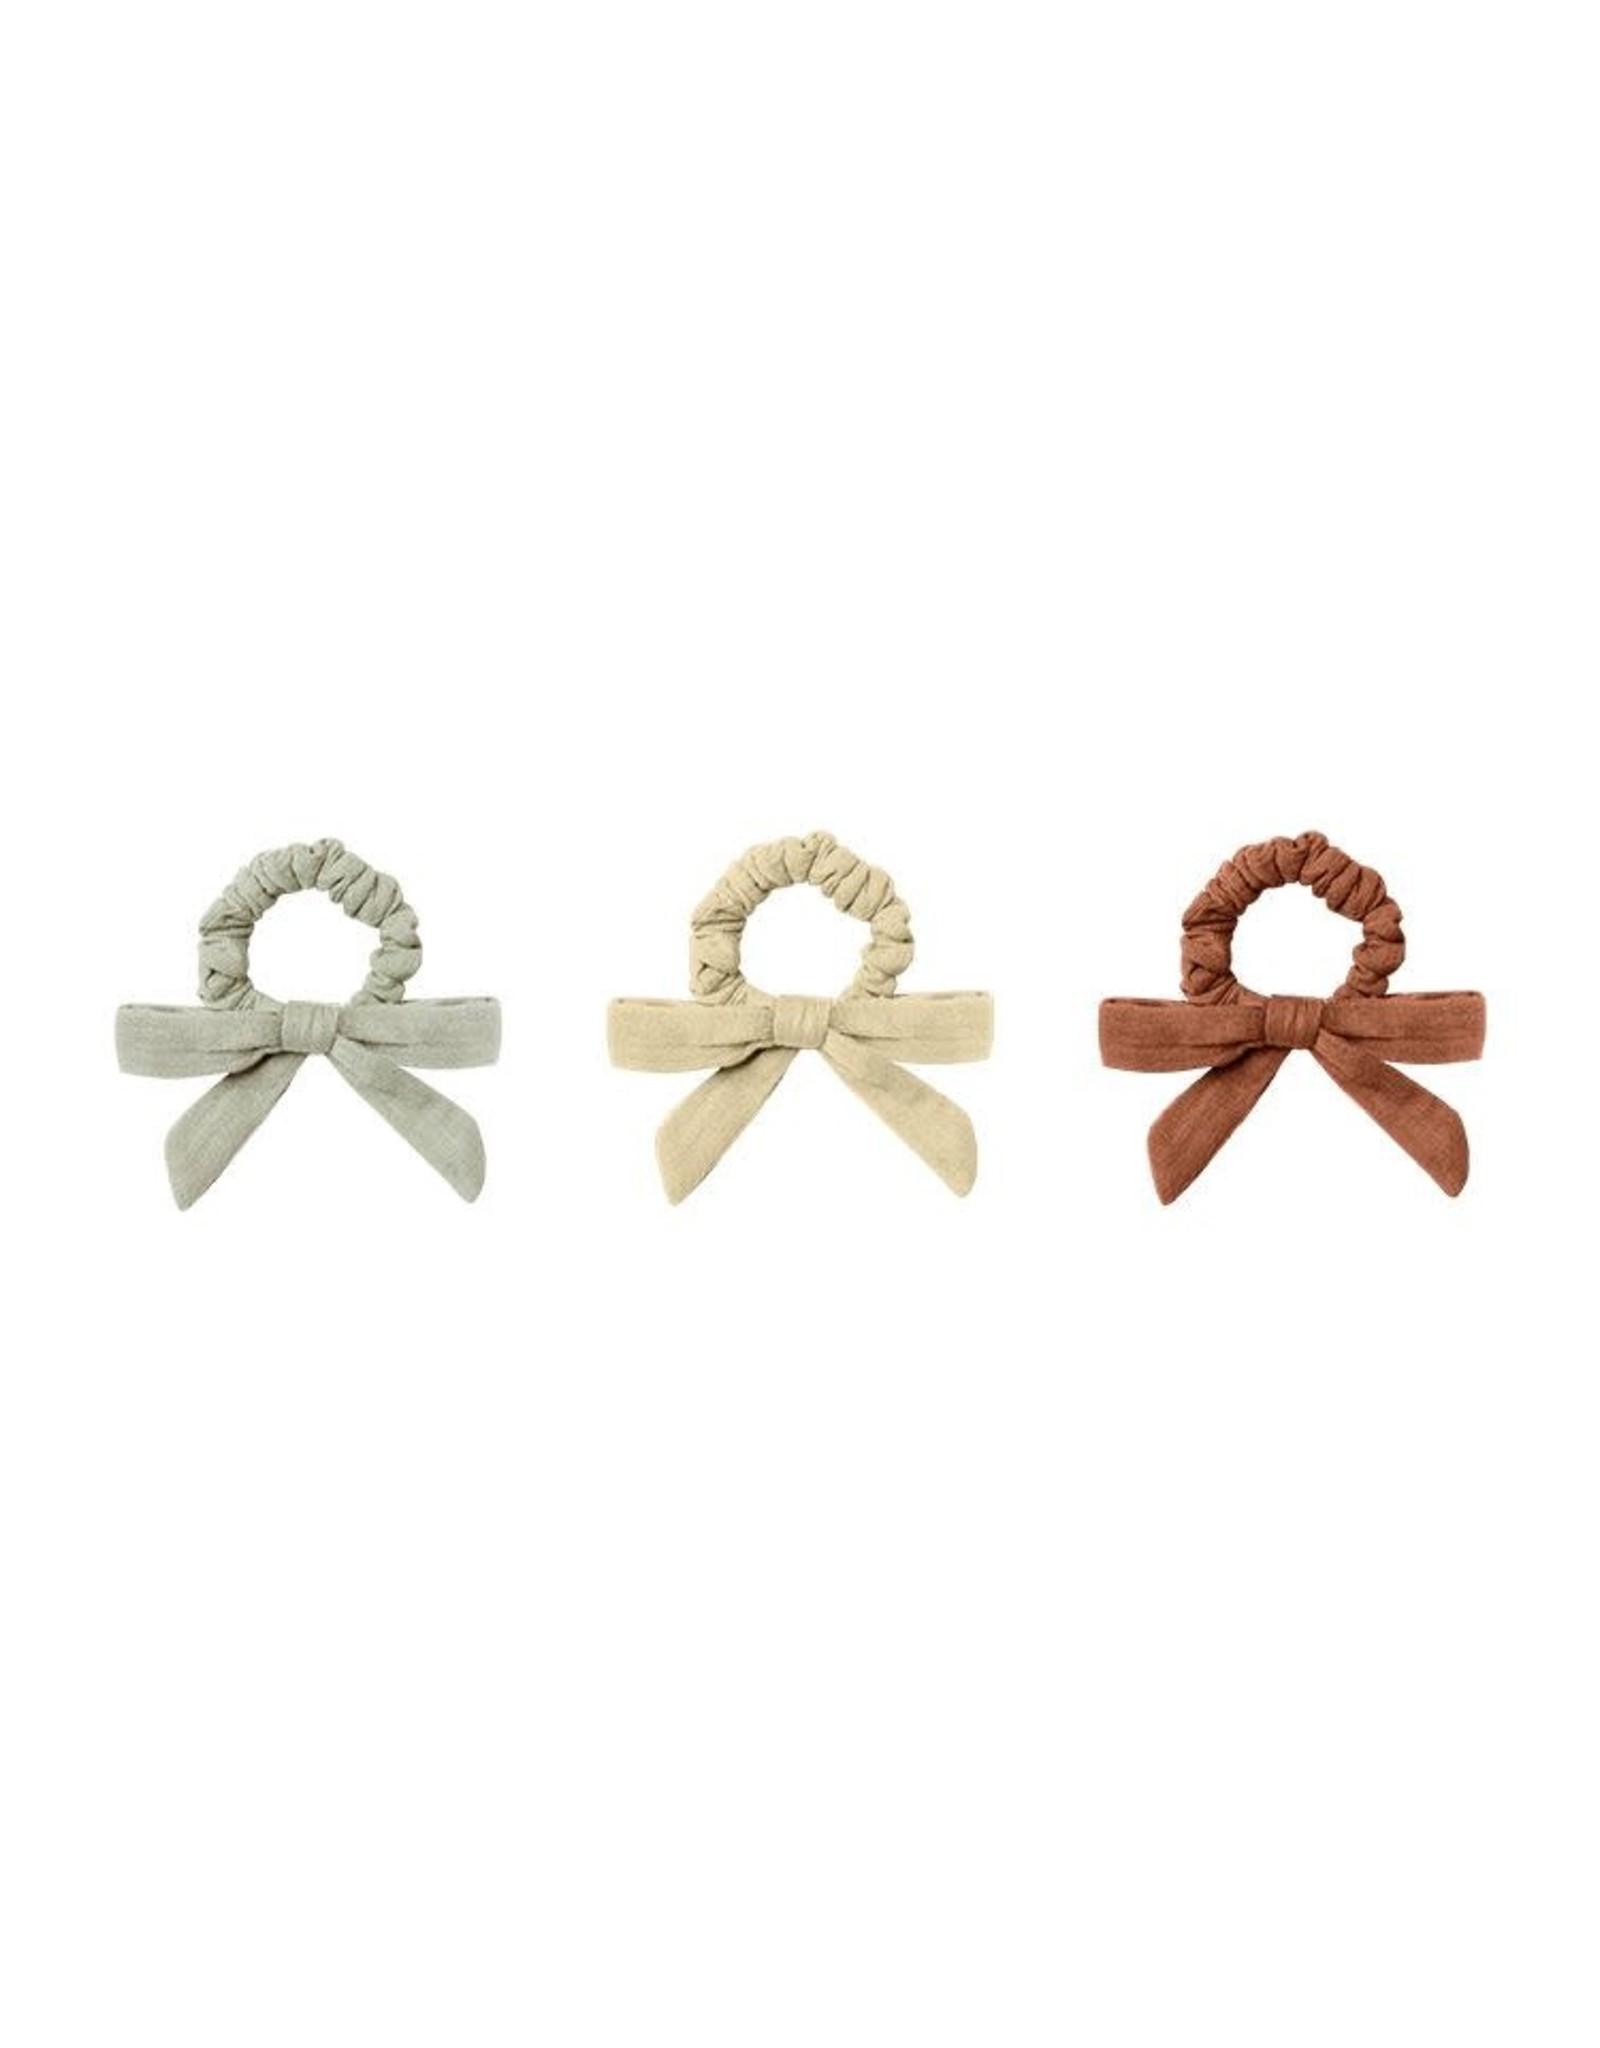 Rylee & Cru Rylee & Cru Little Bow Scrunchie Set